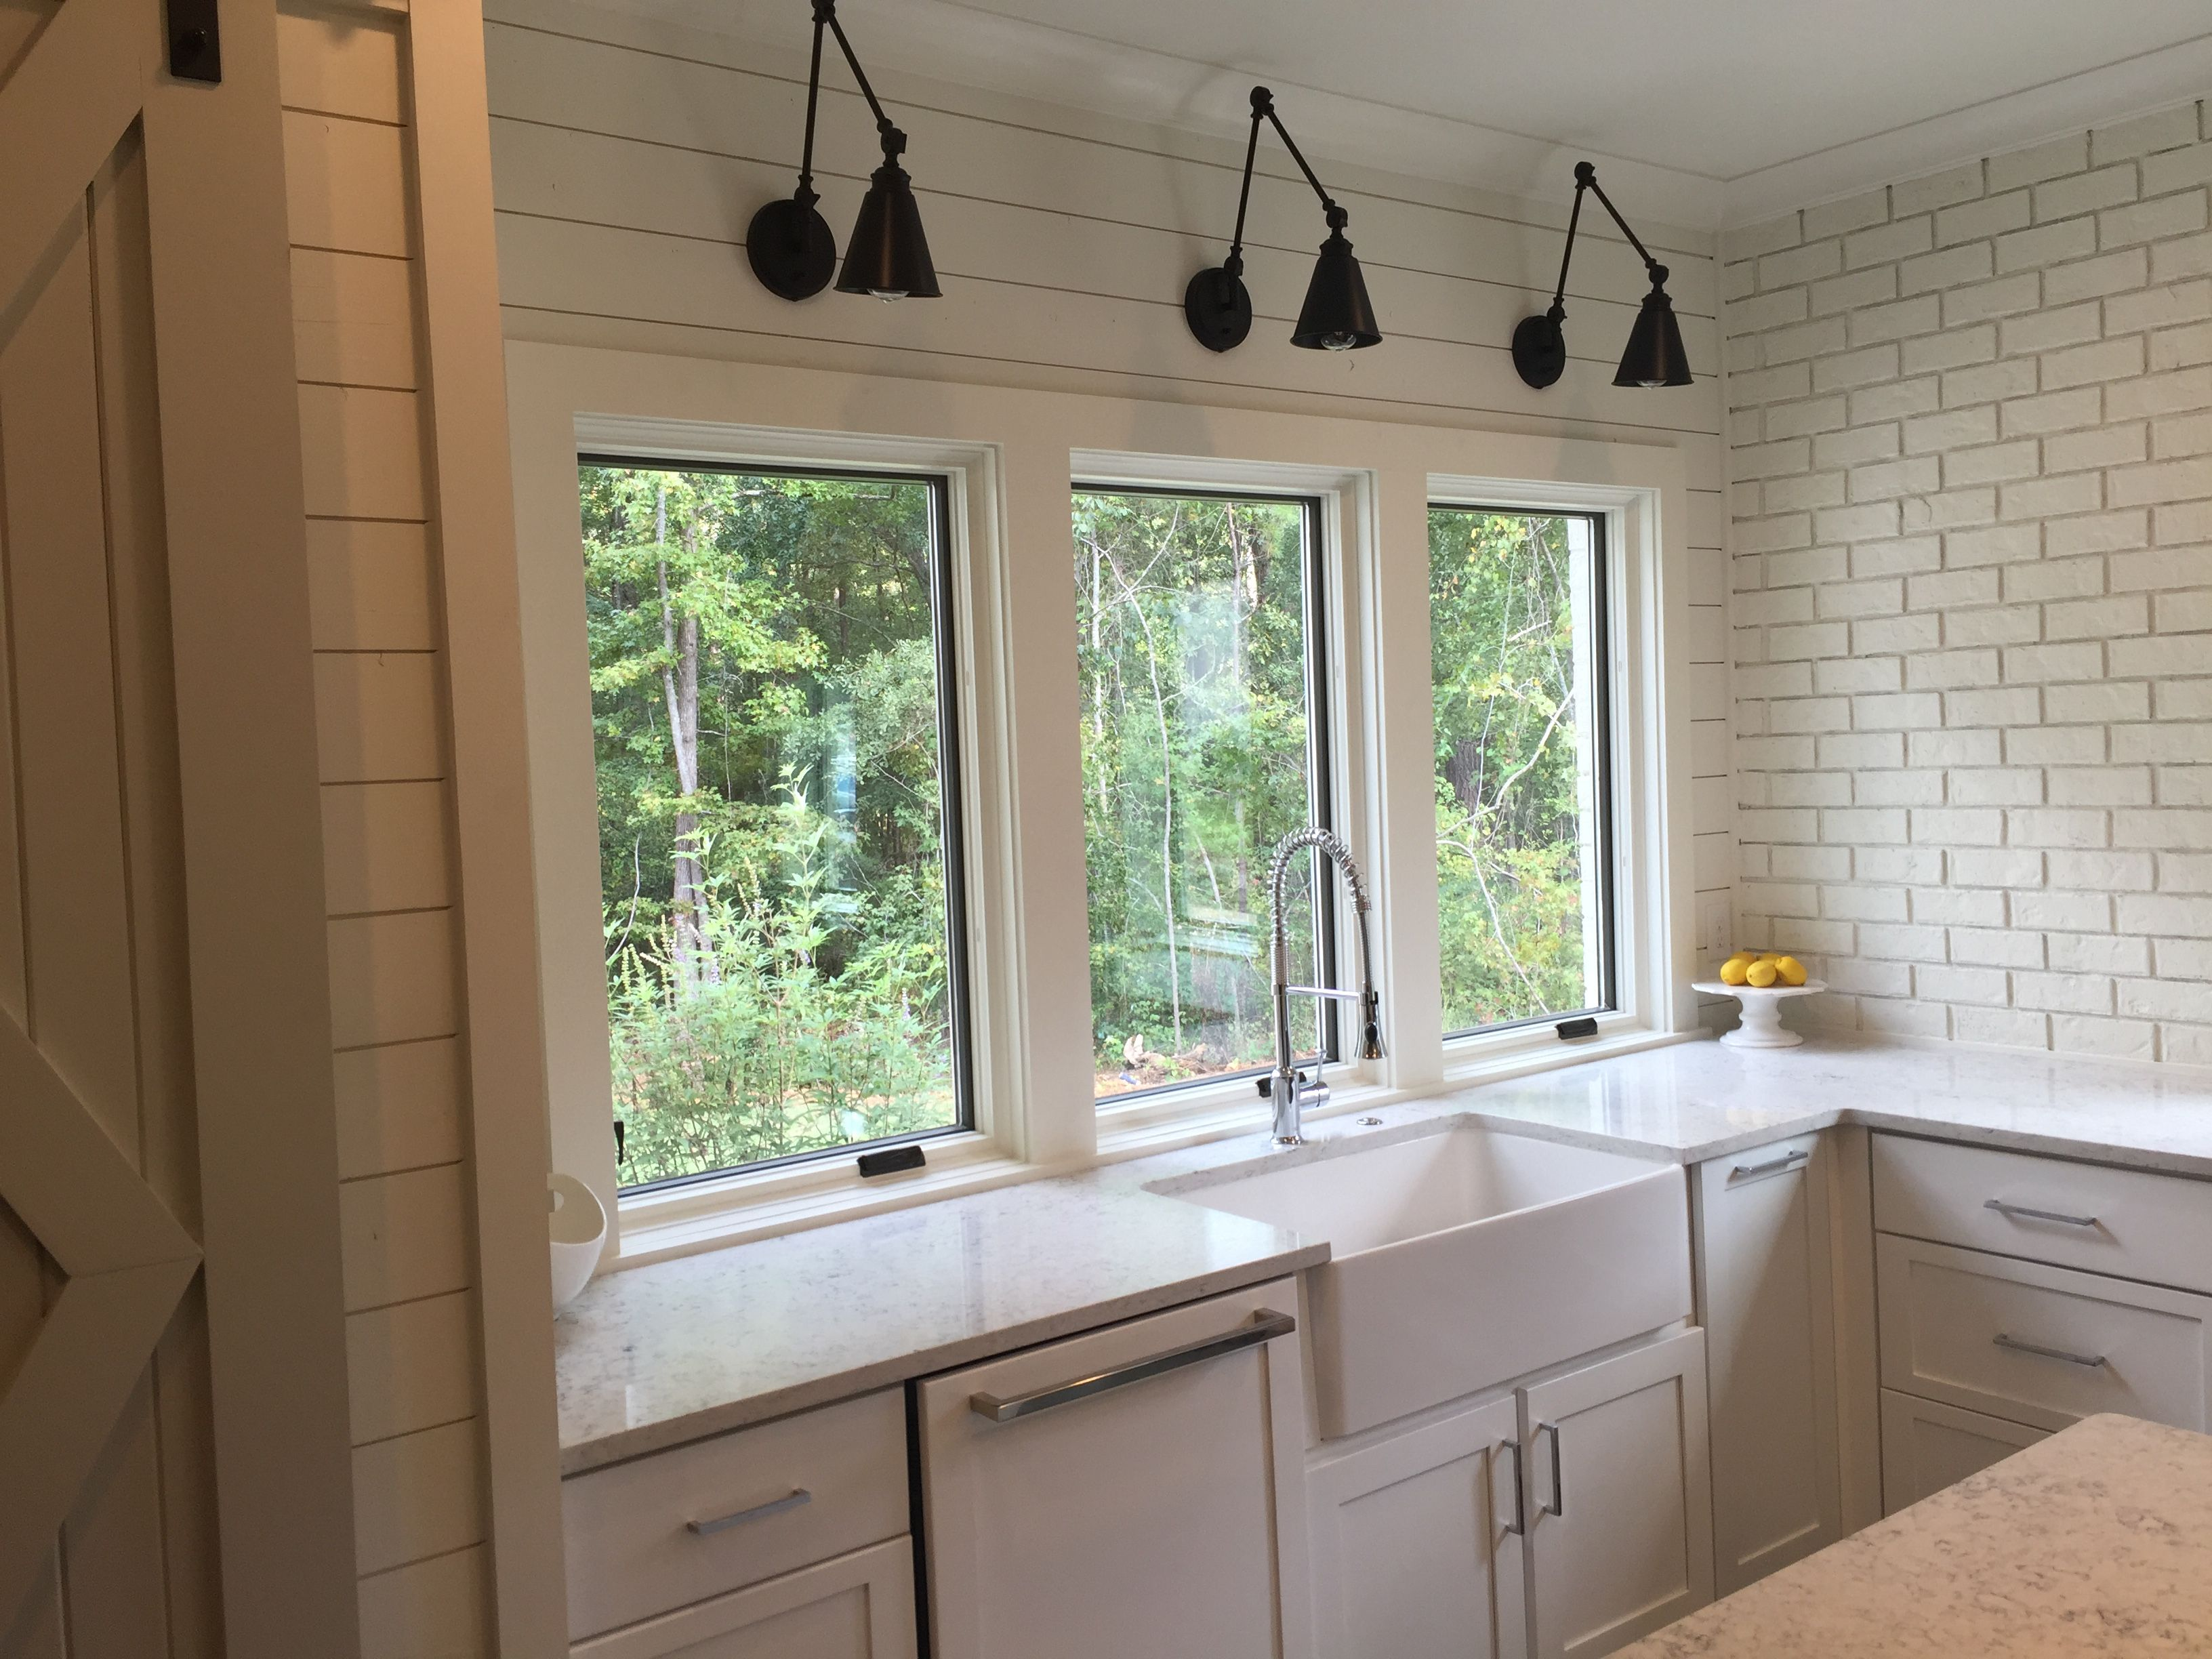 american standard windows double hung shiplap farmhouse sink wood paneled dishwasher kitchen aid savoy house sconces american standard faucet pella windows and benjamin moore white dove aid